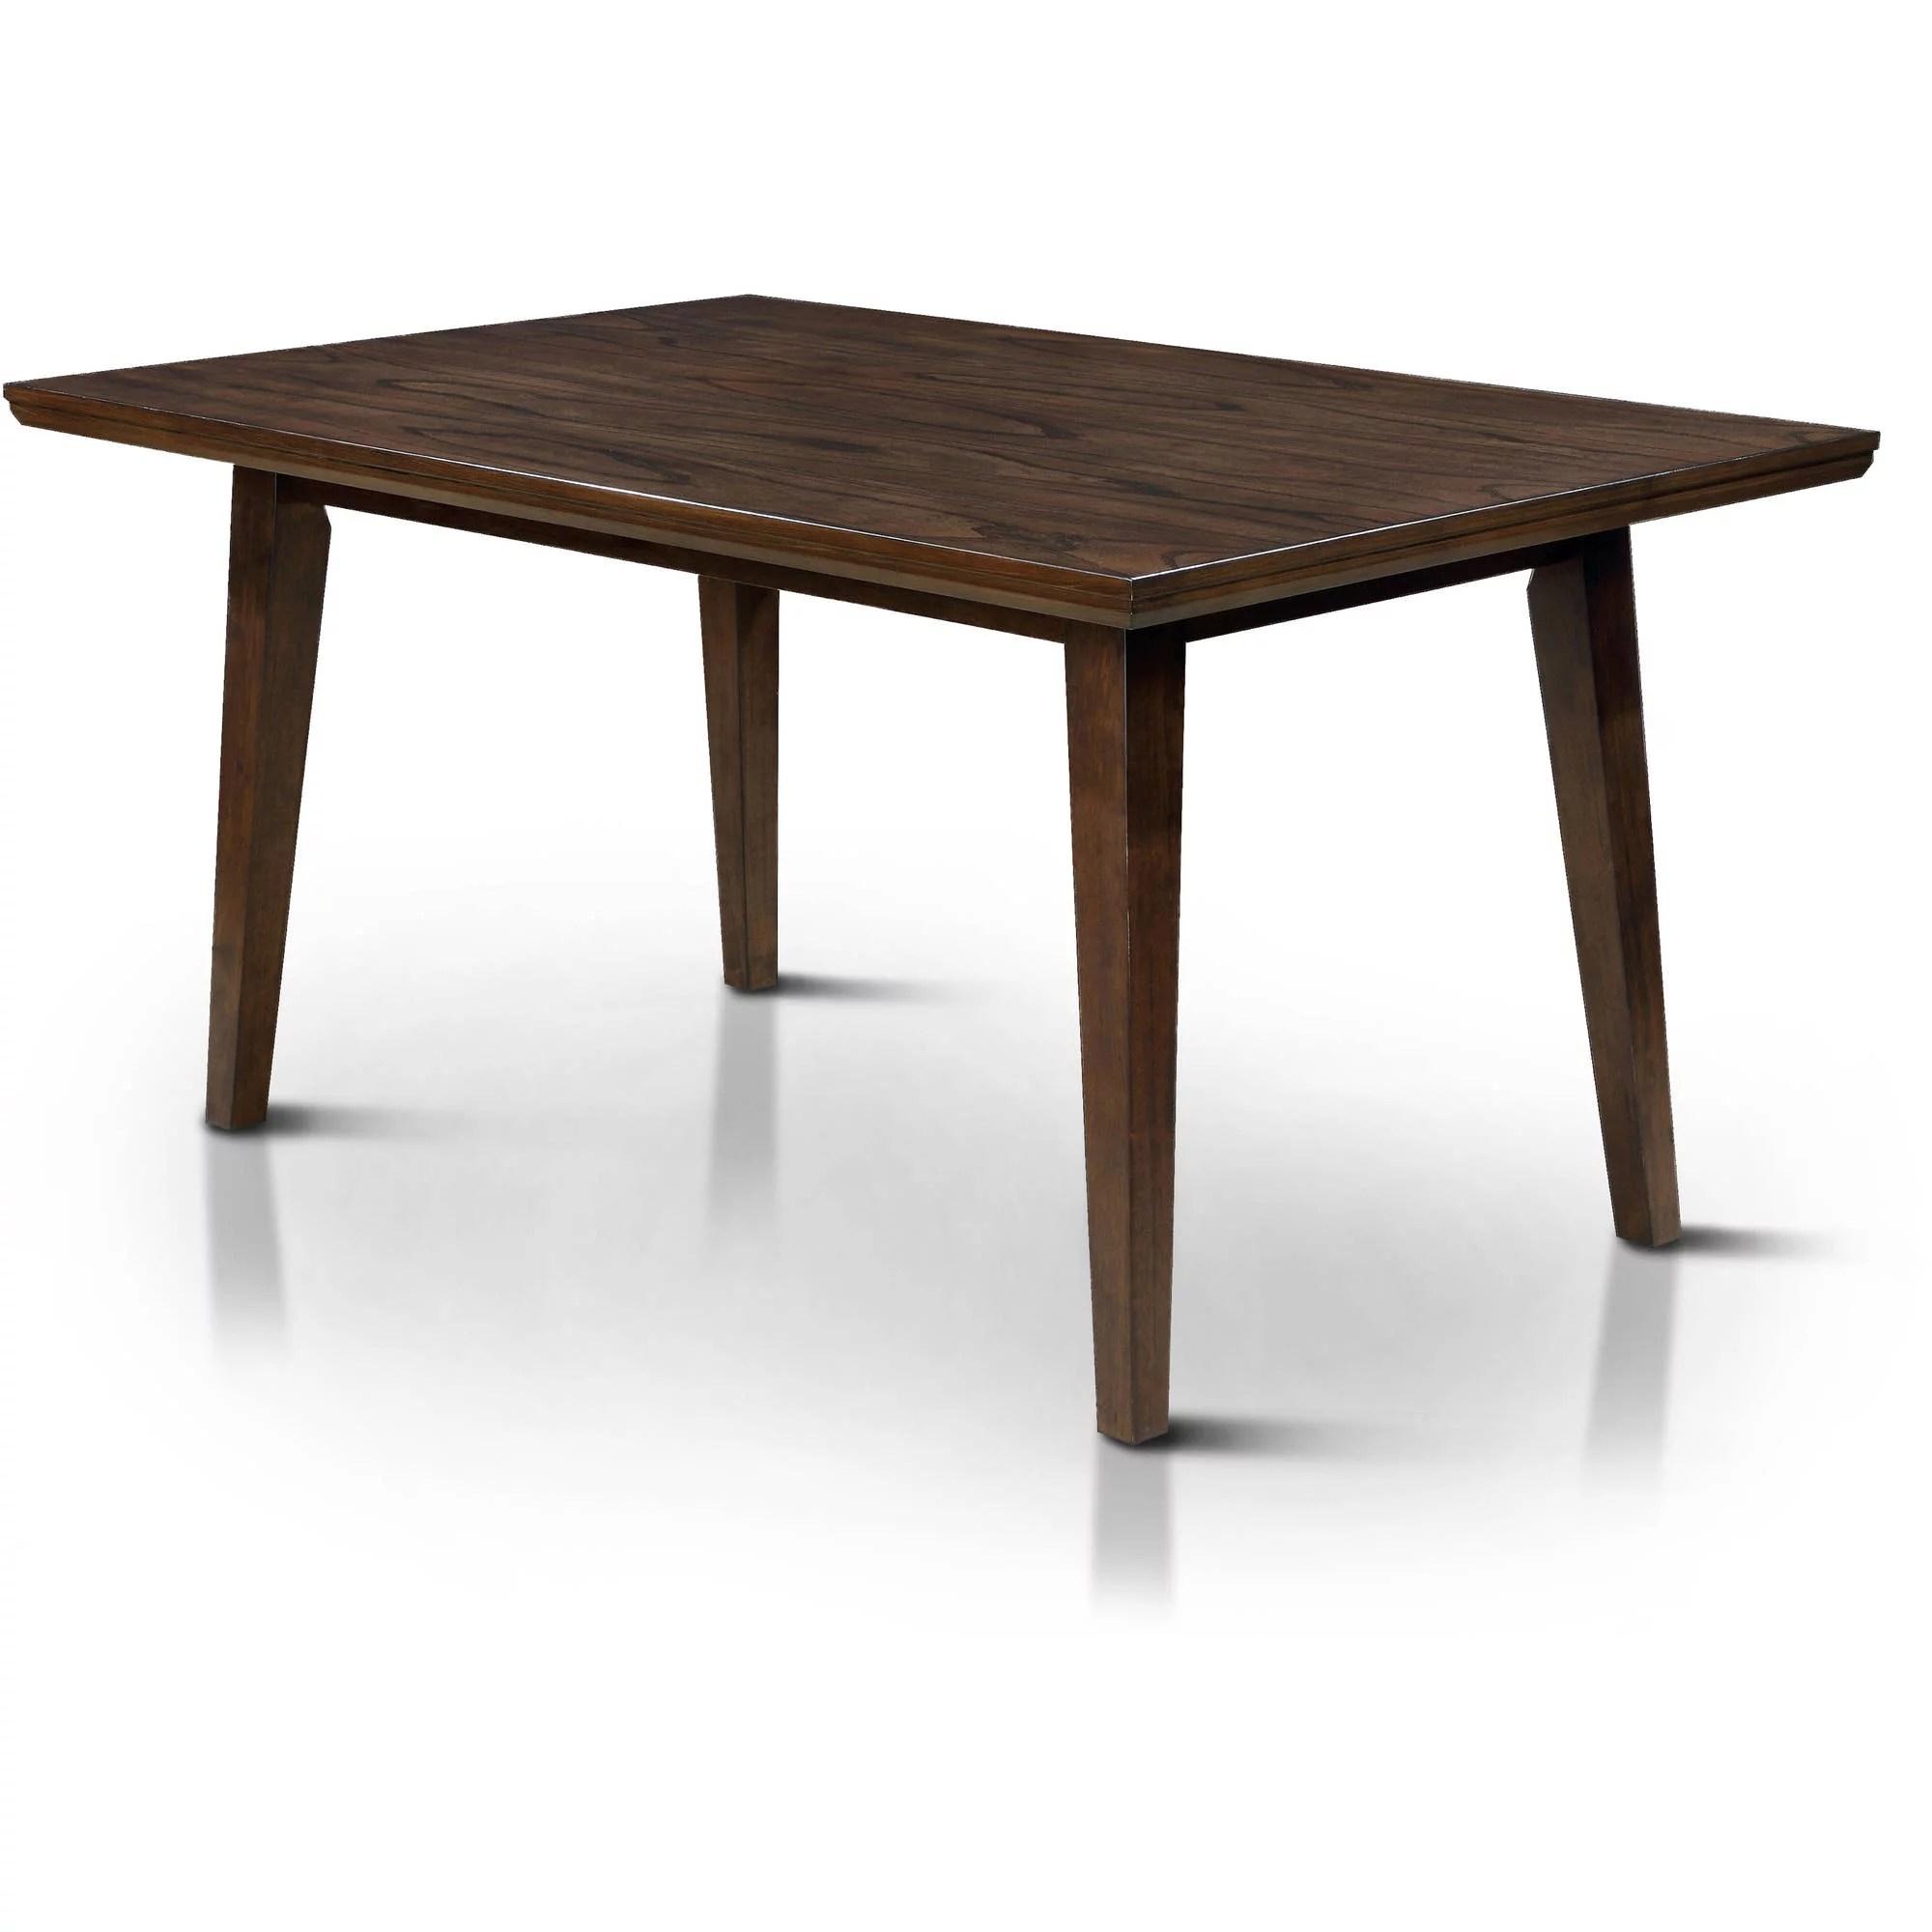 Furniture of America Lailina Mid